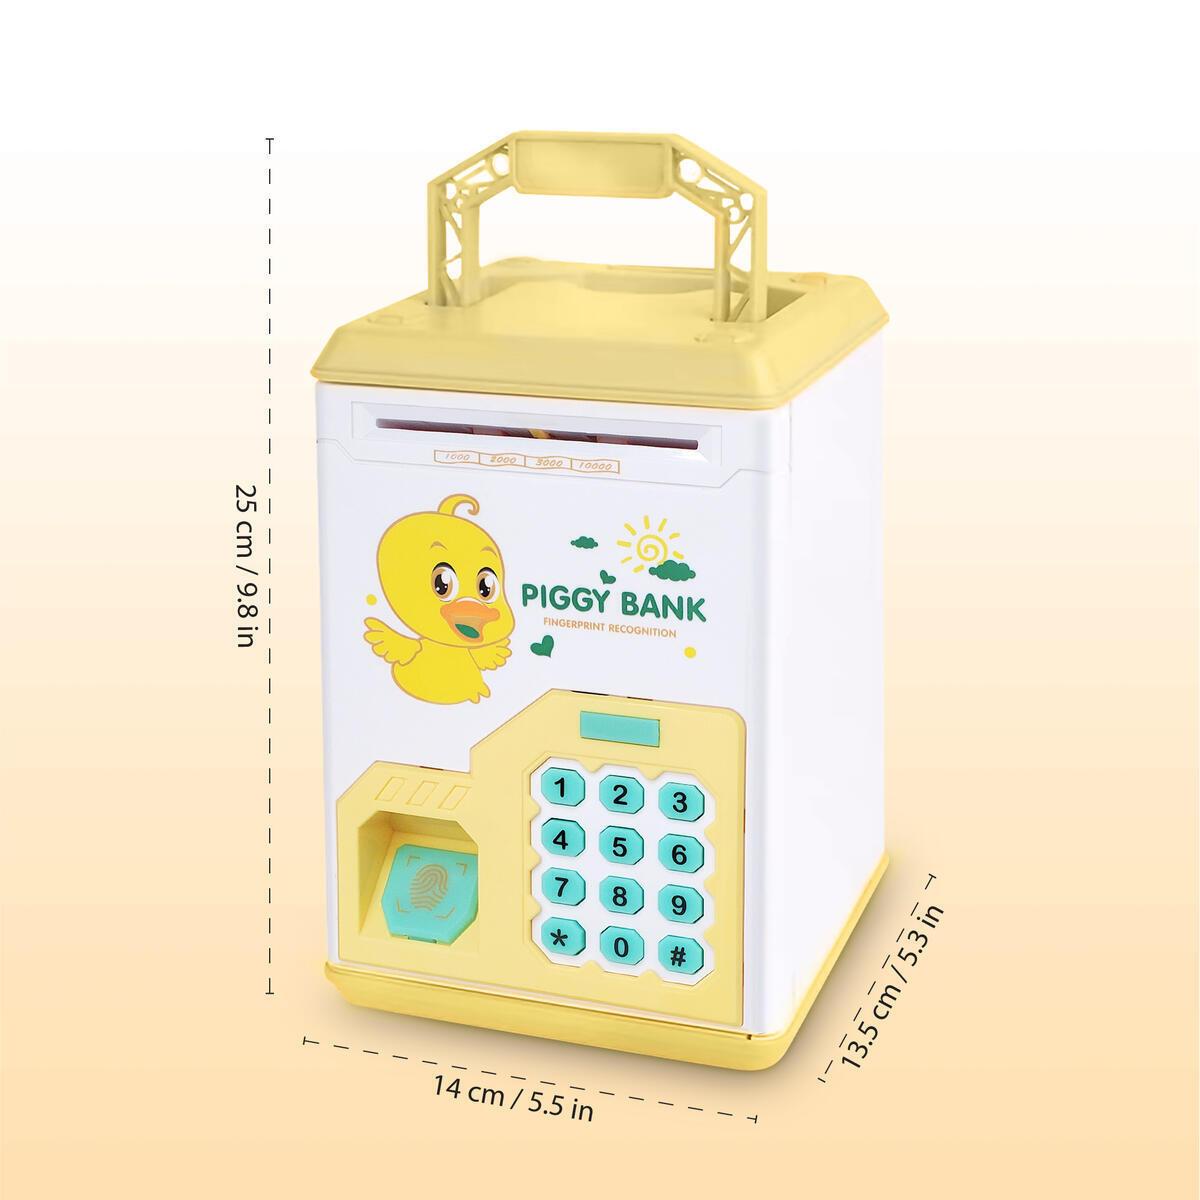 Buddy N Buddies Kids Money Safe Box ATM Safe Bank Fingerprint and Password Electronic Piggy Bank Cash Coin